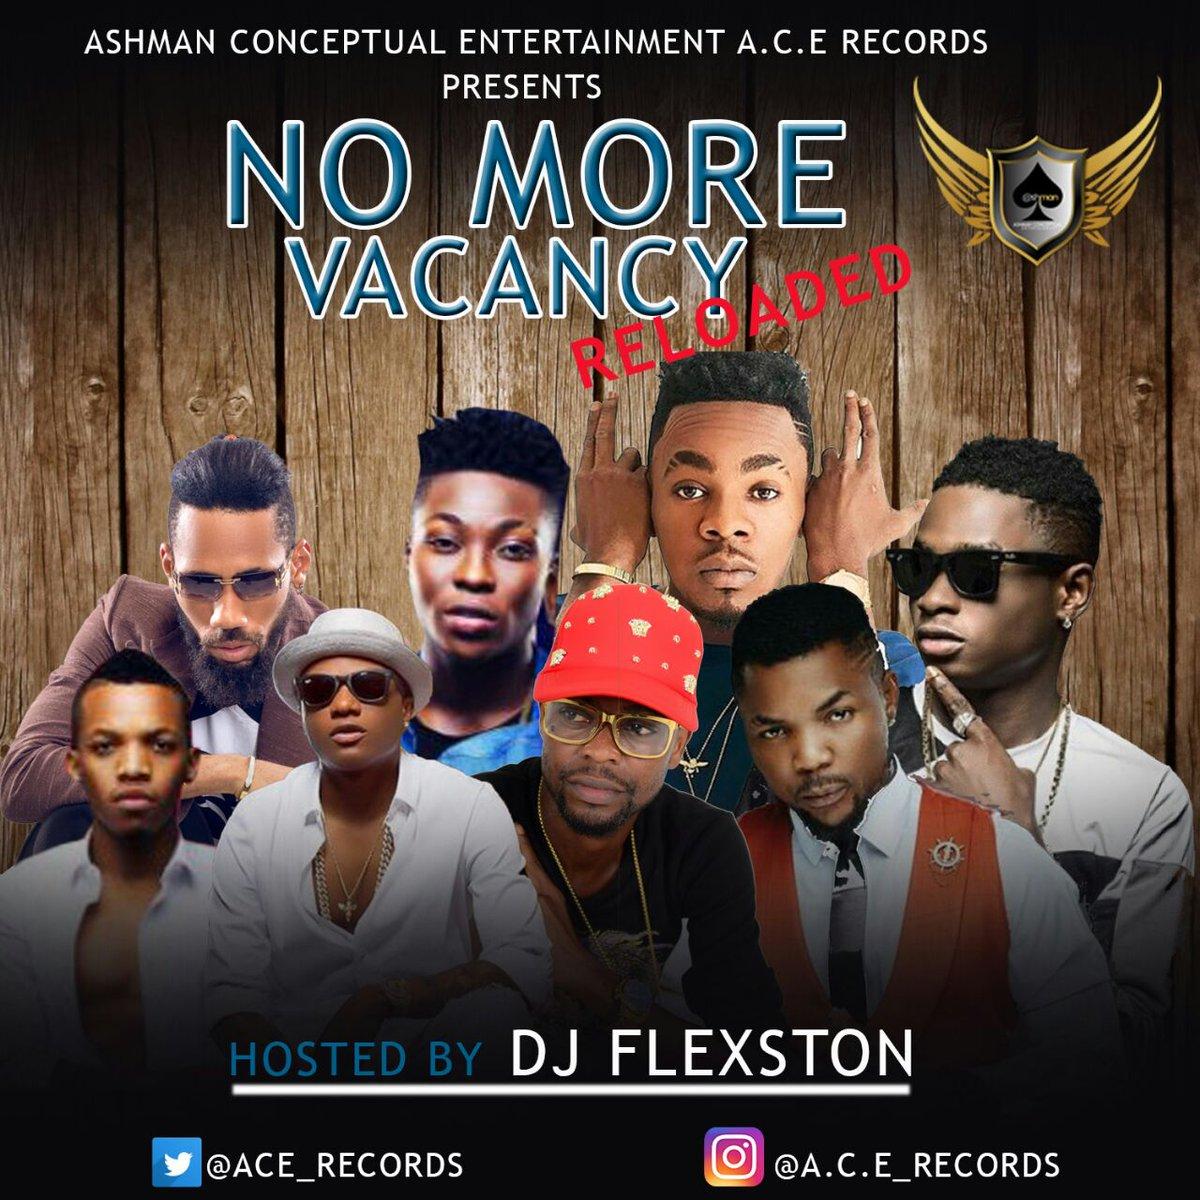 #KingZaga_NoMoreVacancy Mixtape Reloaded.  COMING SOON! COMING SOON!!